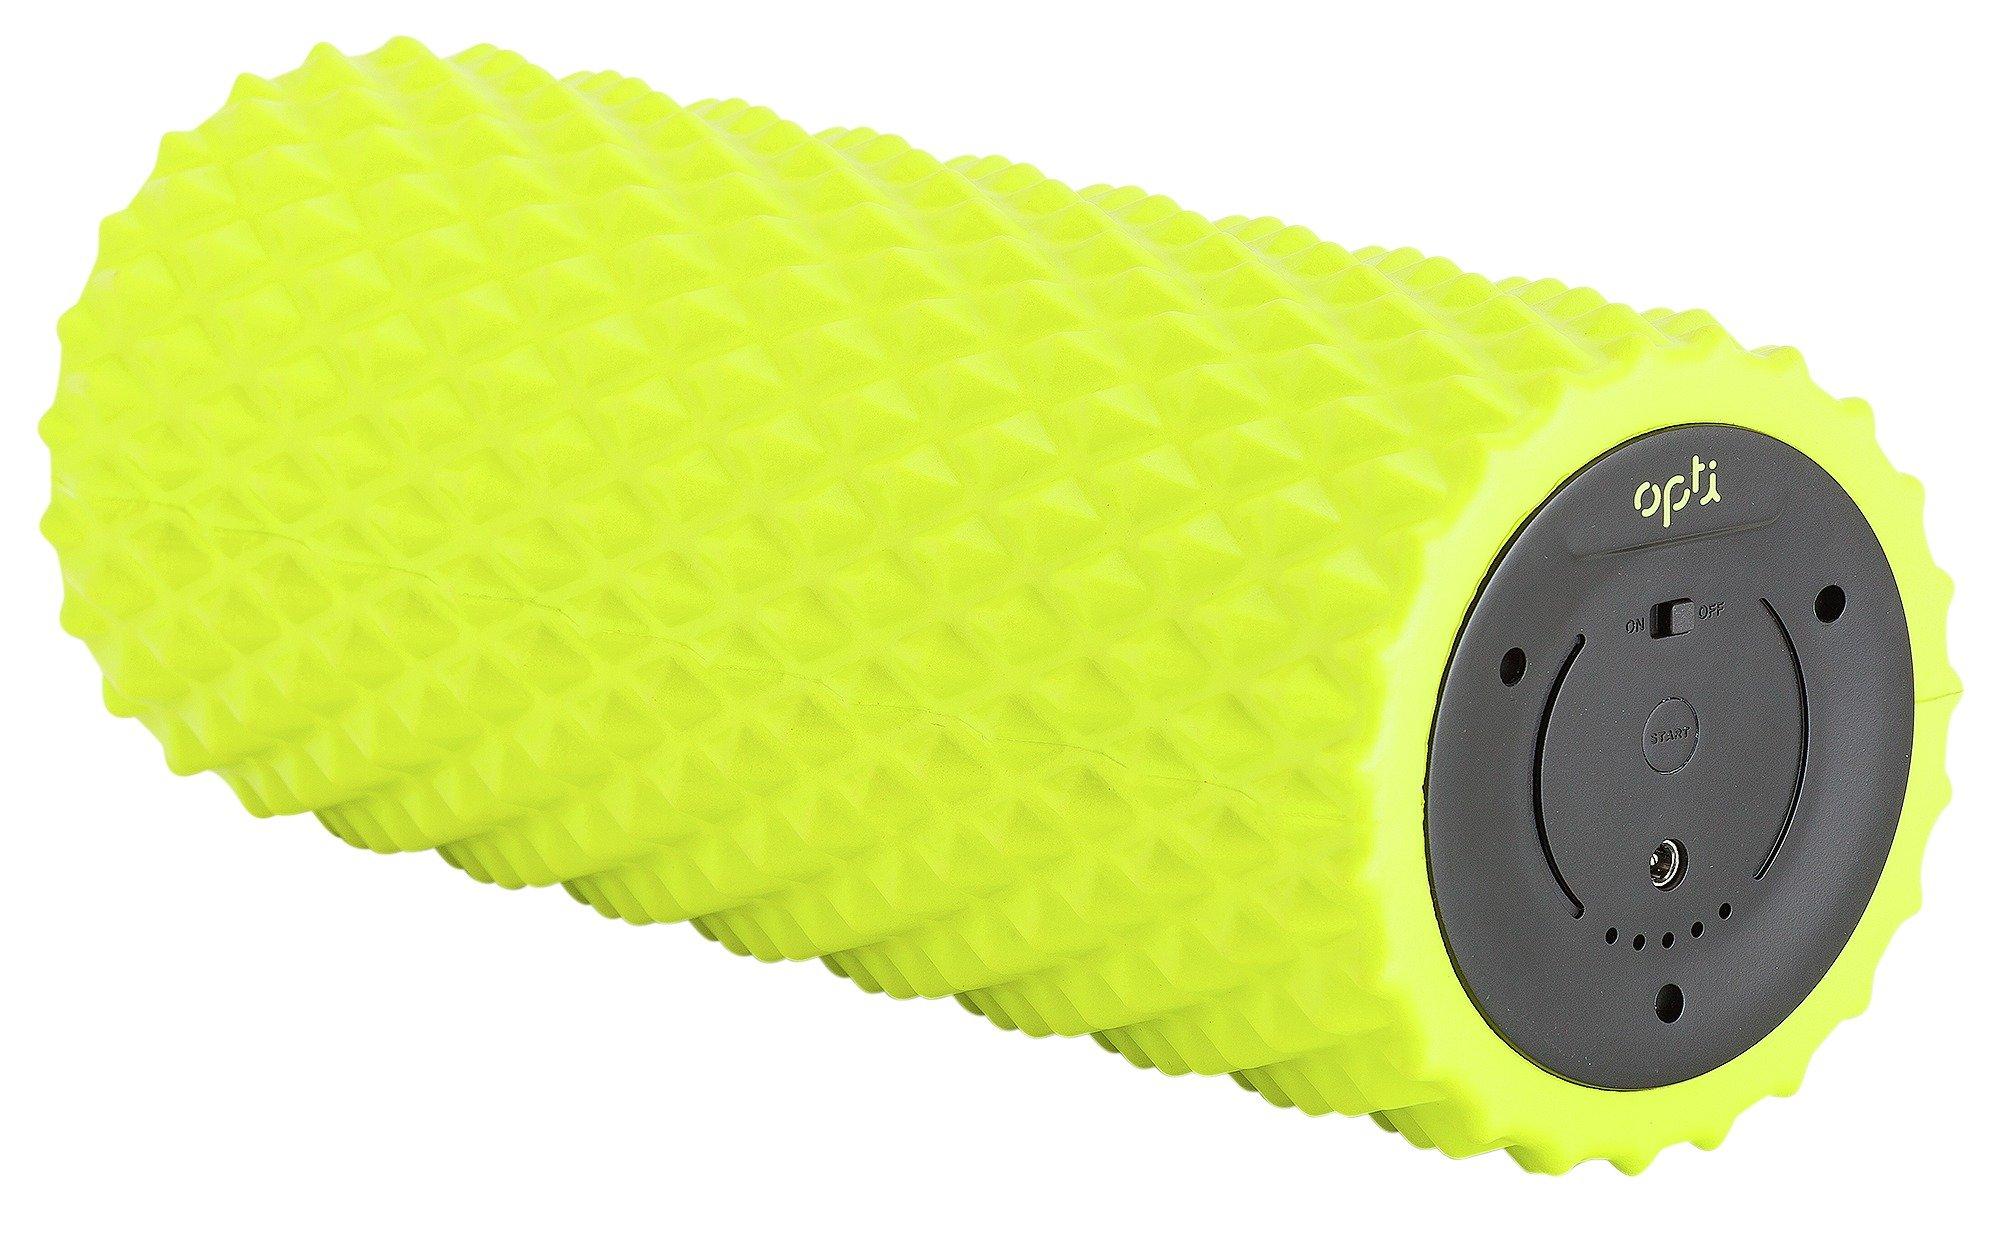 opti-vibrating-foam-roller